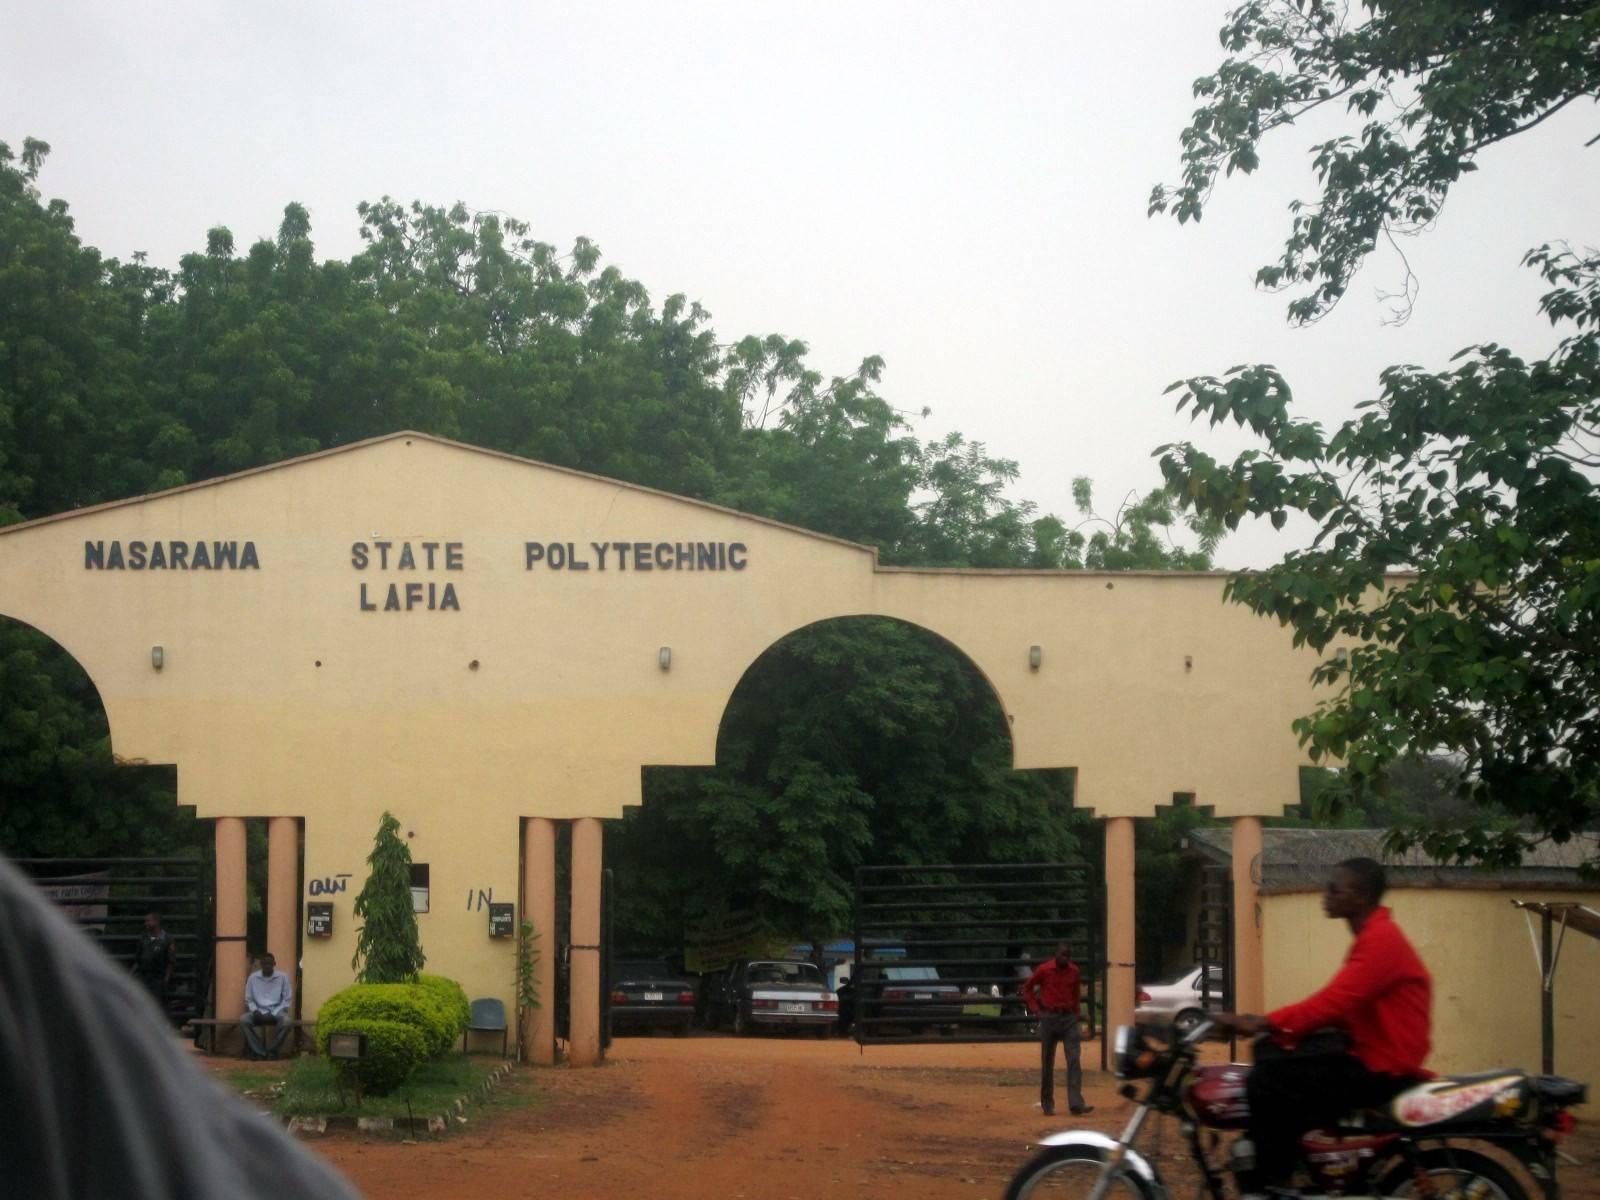 Nasarawa State Polytechnic1